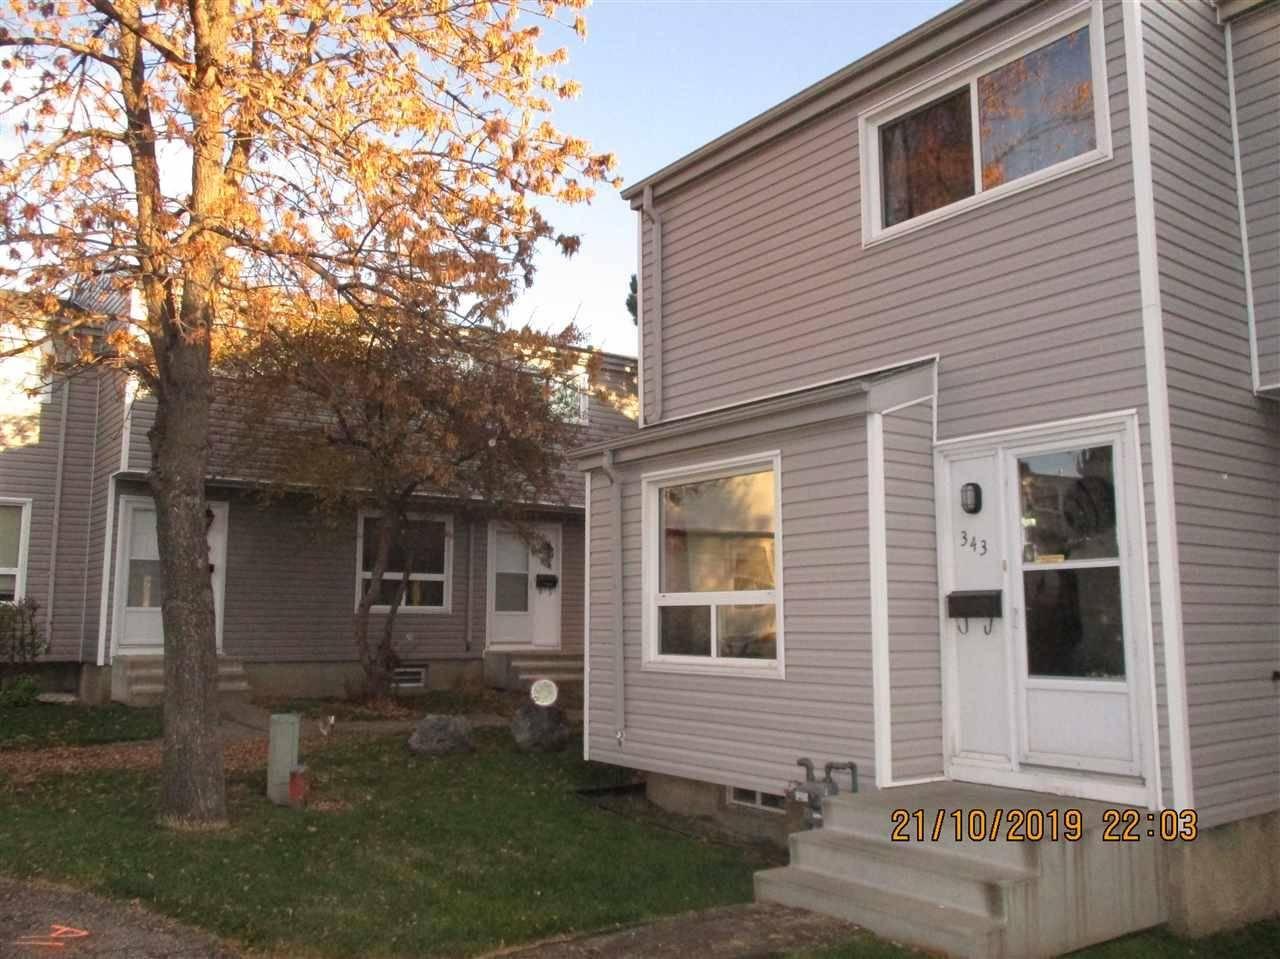 Townhouse for sale at 343 Northgate Te Nw Edmonton Alberta - MLS: E4177737